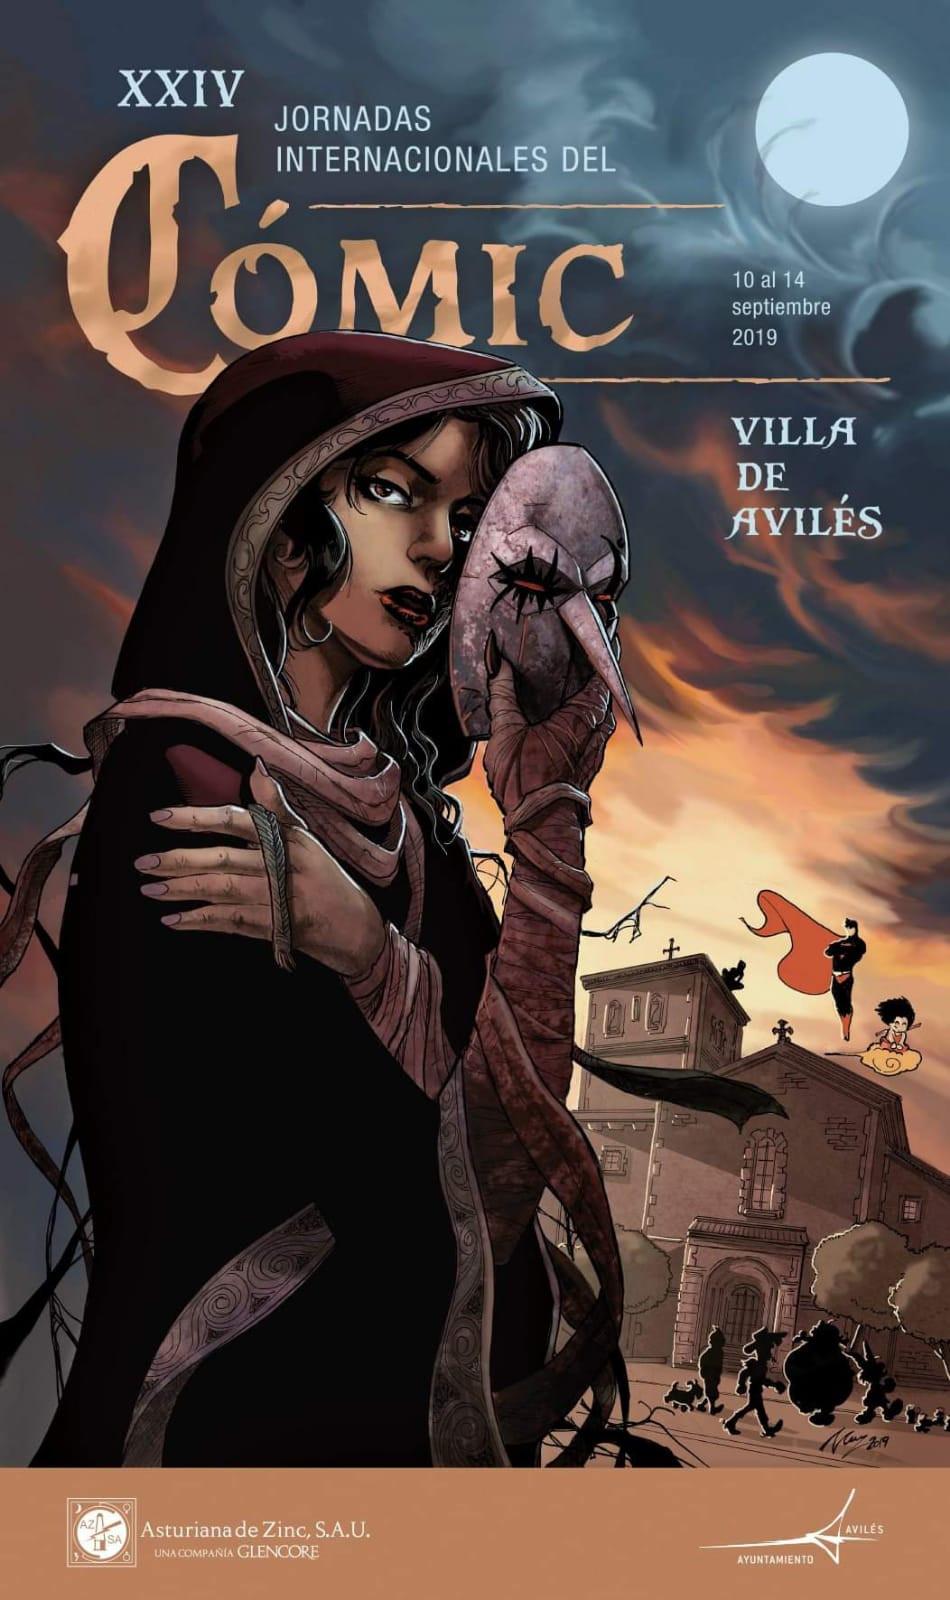 XXIV Jornadas de Comic de Aviles 2019